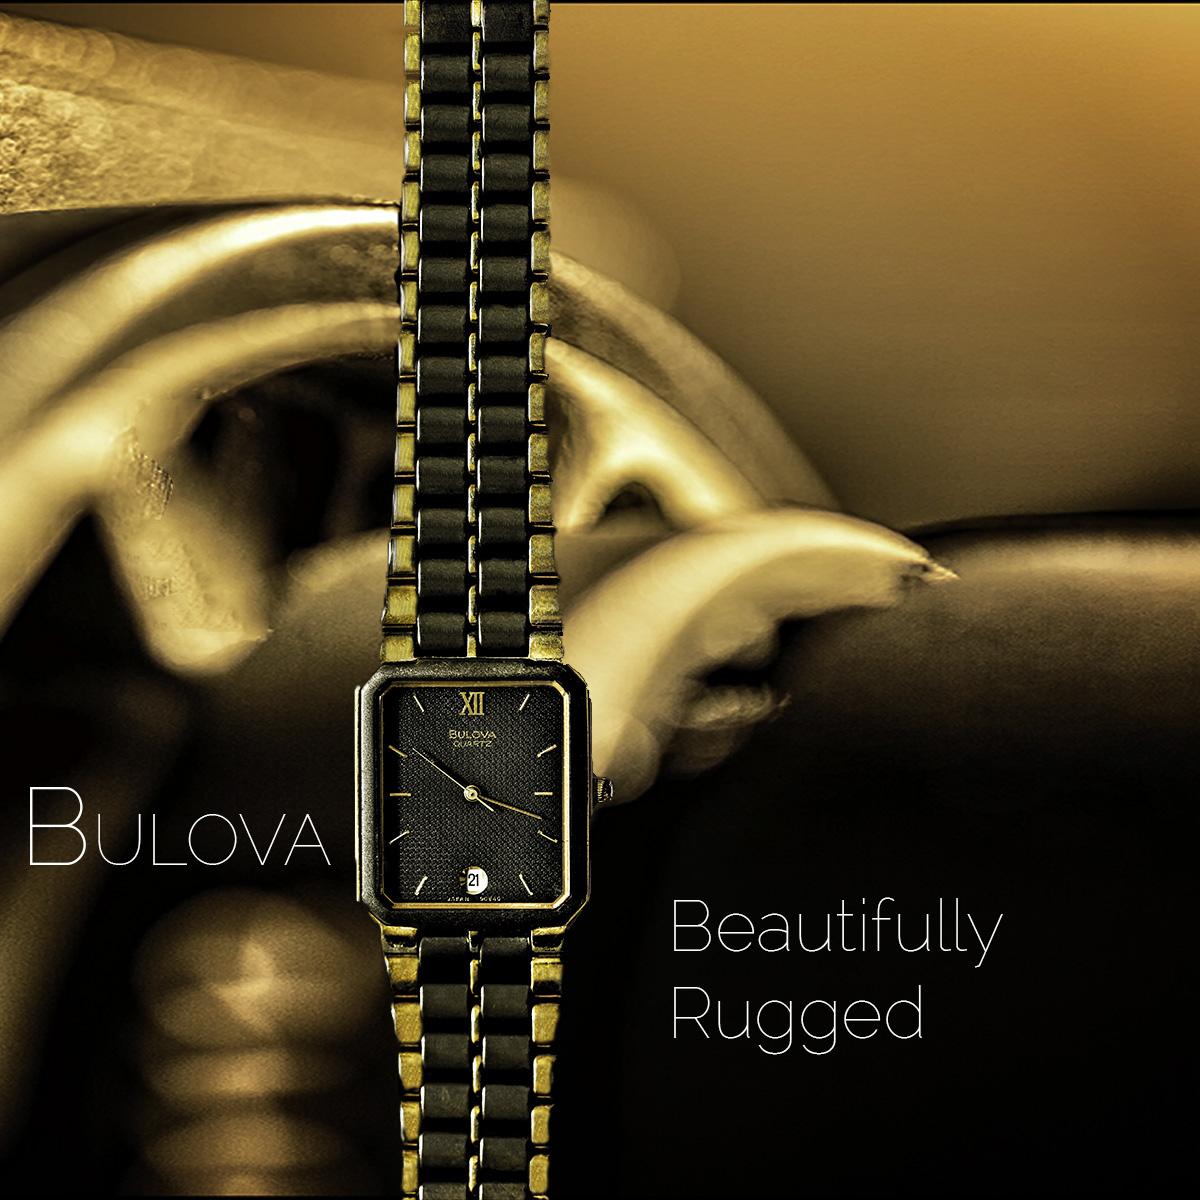 Bulova - Beautifully Rugged